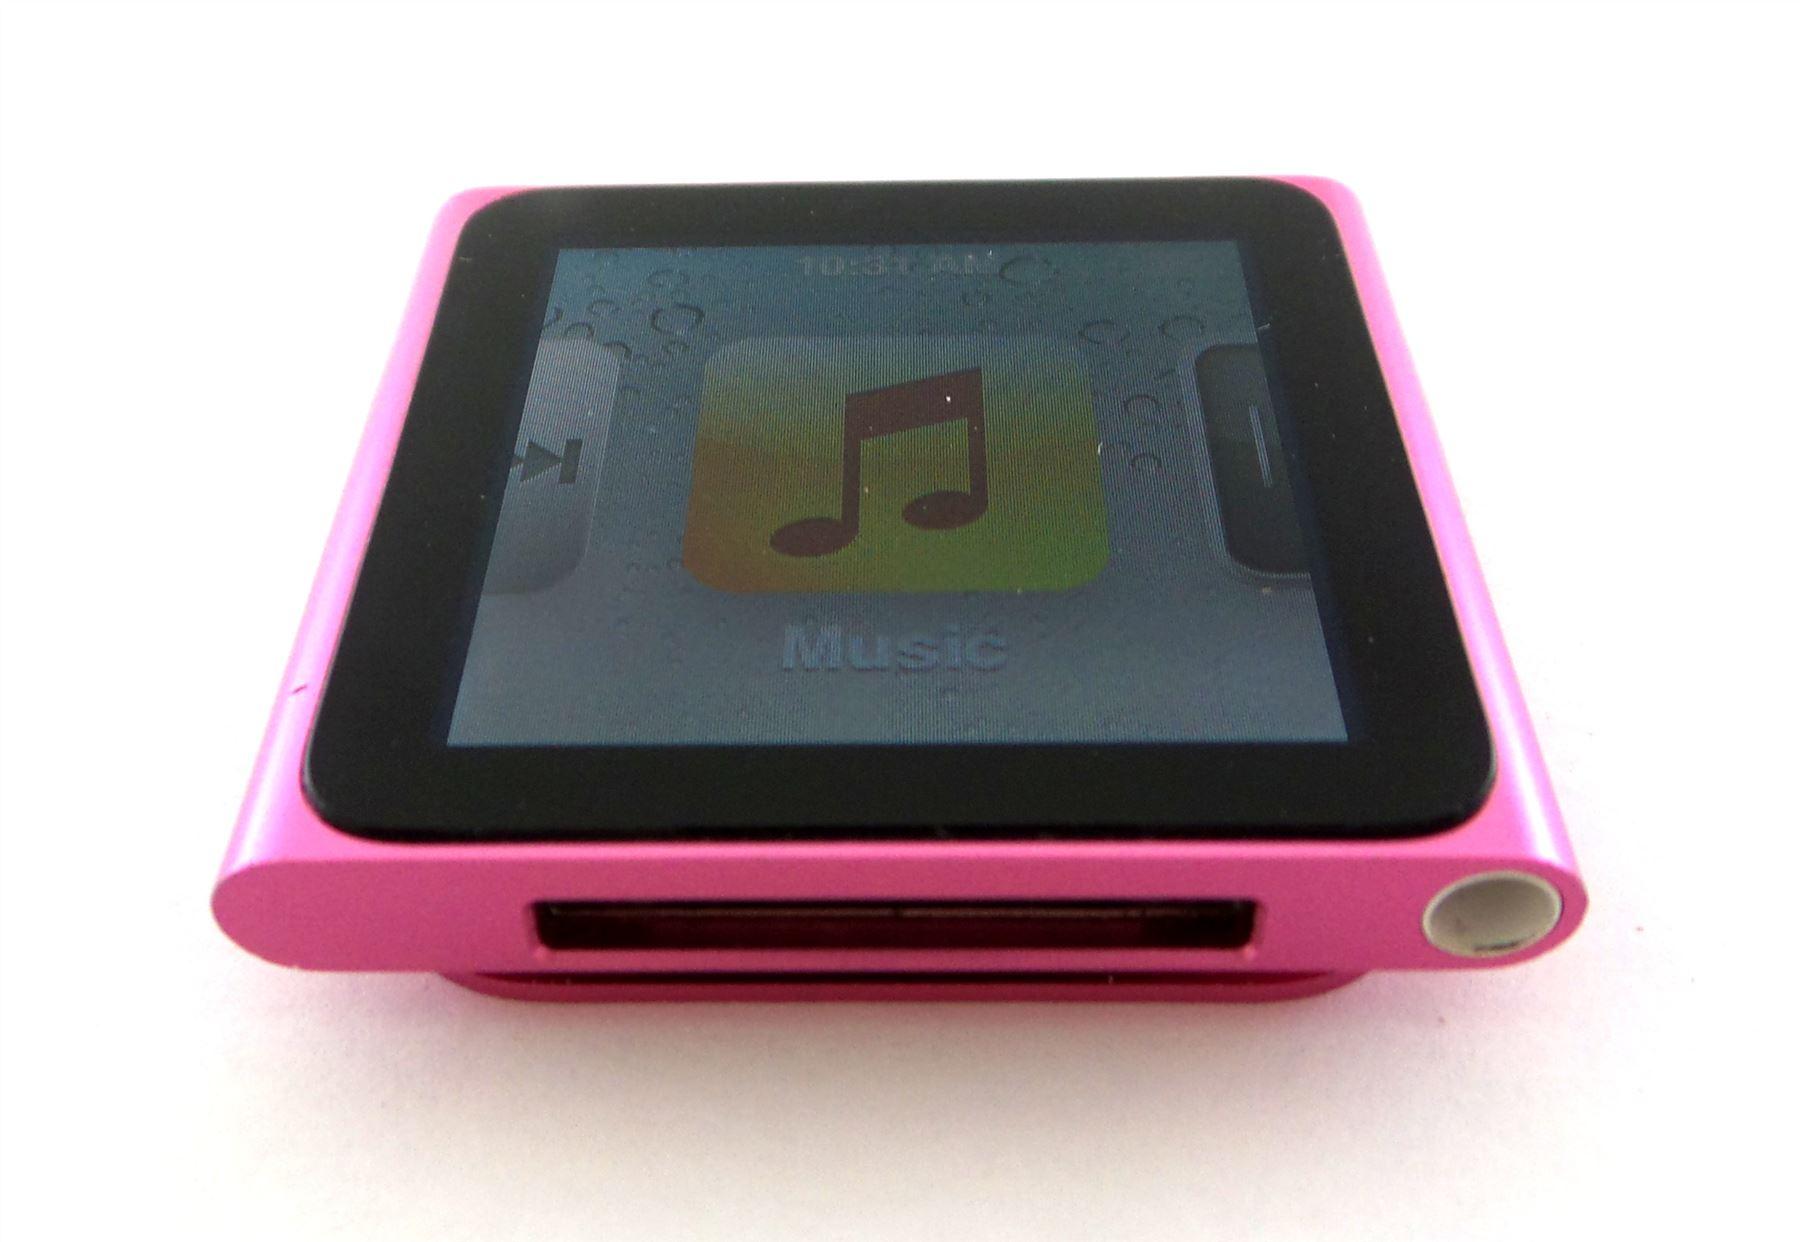 apple ipod nano 6th generation 8gb 16gb green pink silver. Black Bedroom Furniture Sets. Home Design Ideas